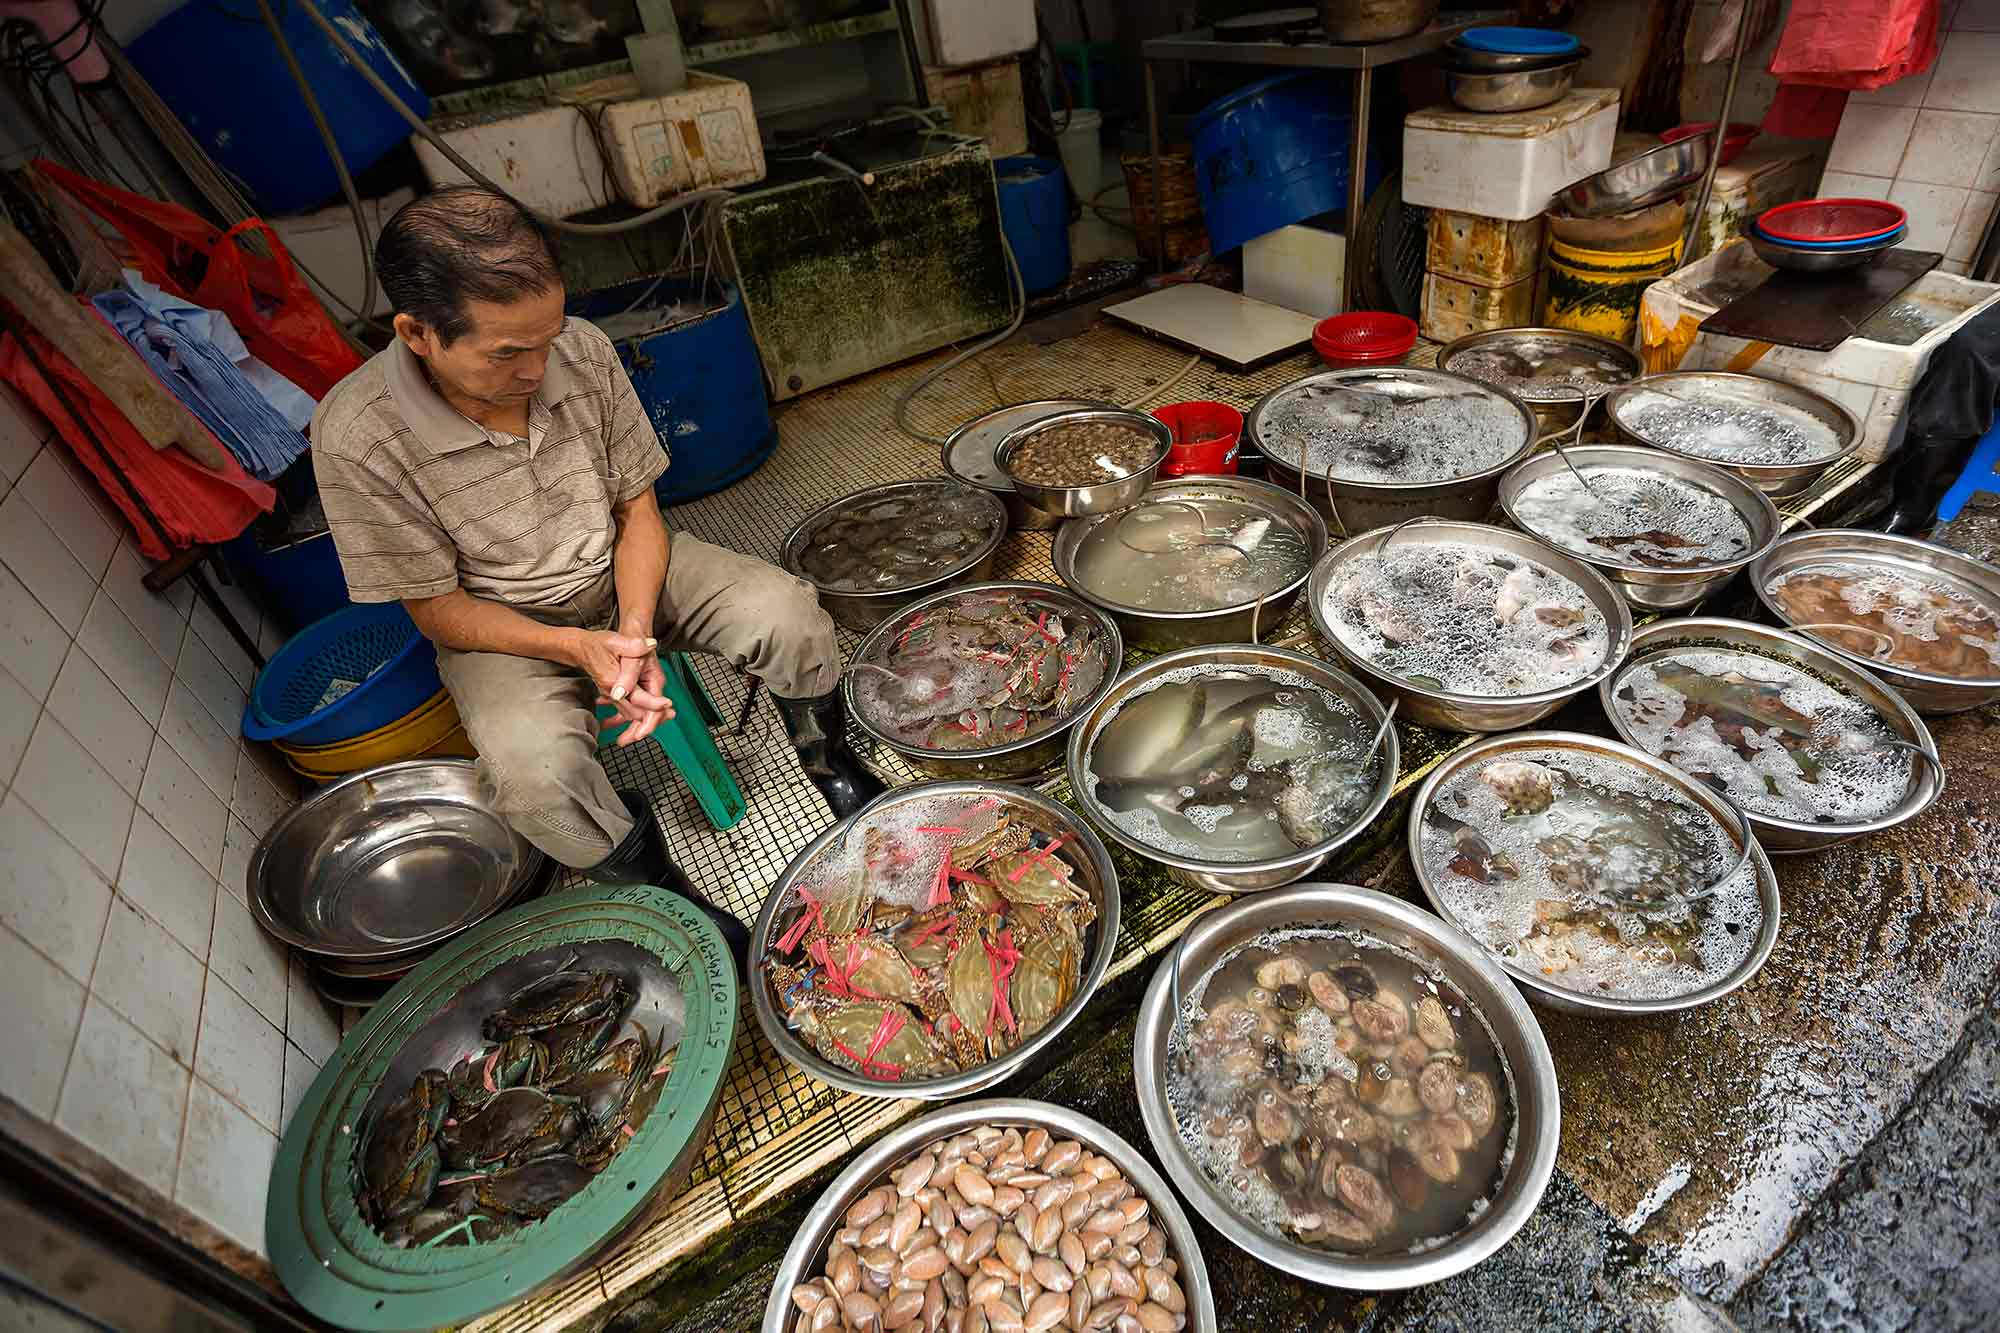 Yao Matei fish market in Mong Kok, Hong Kong. © Ulli Maier & Nisa Maier